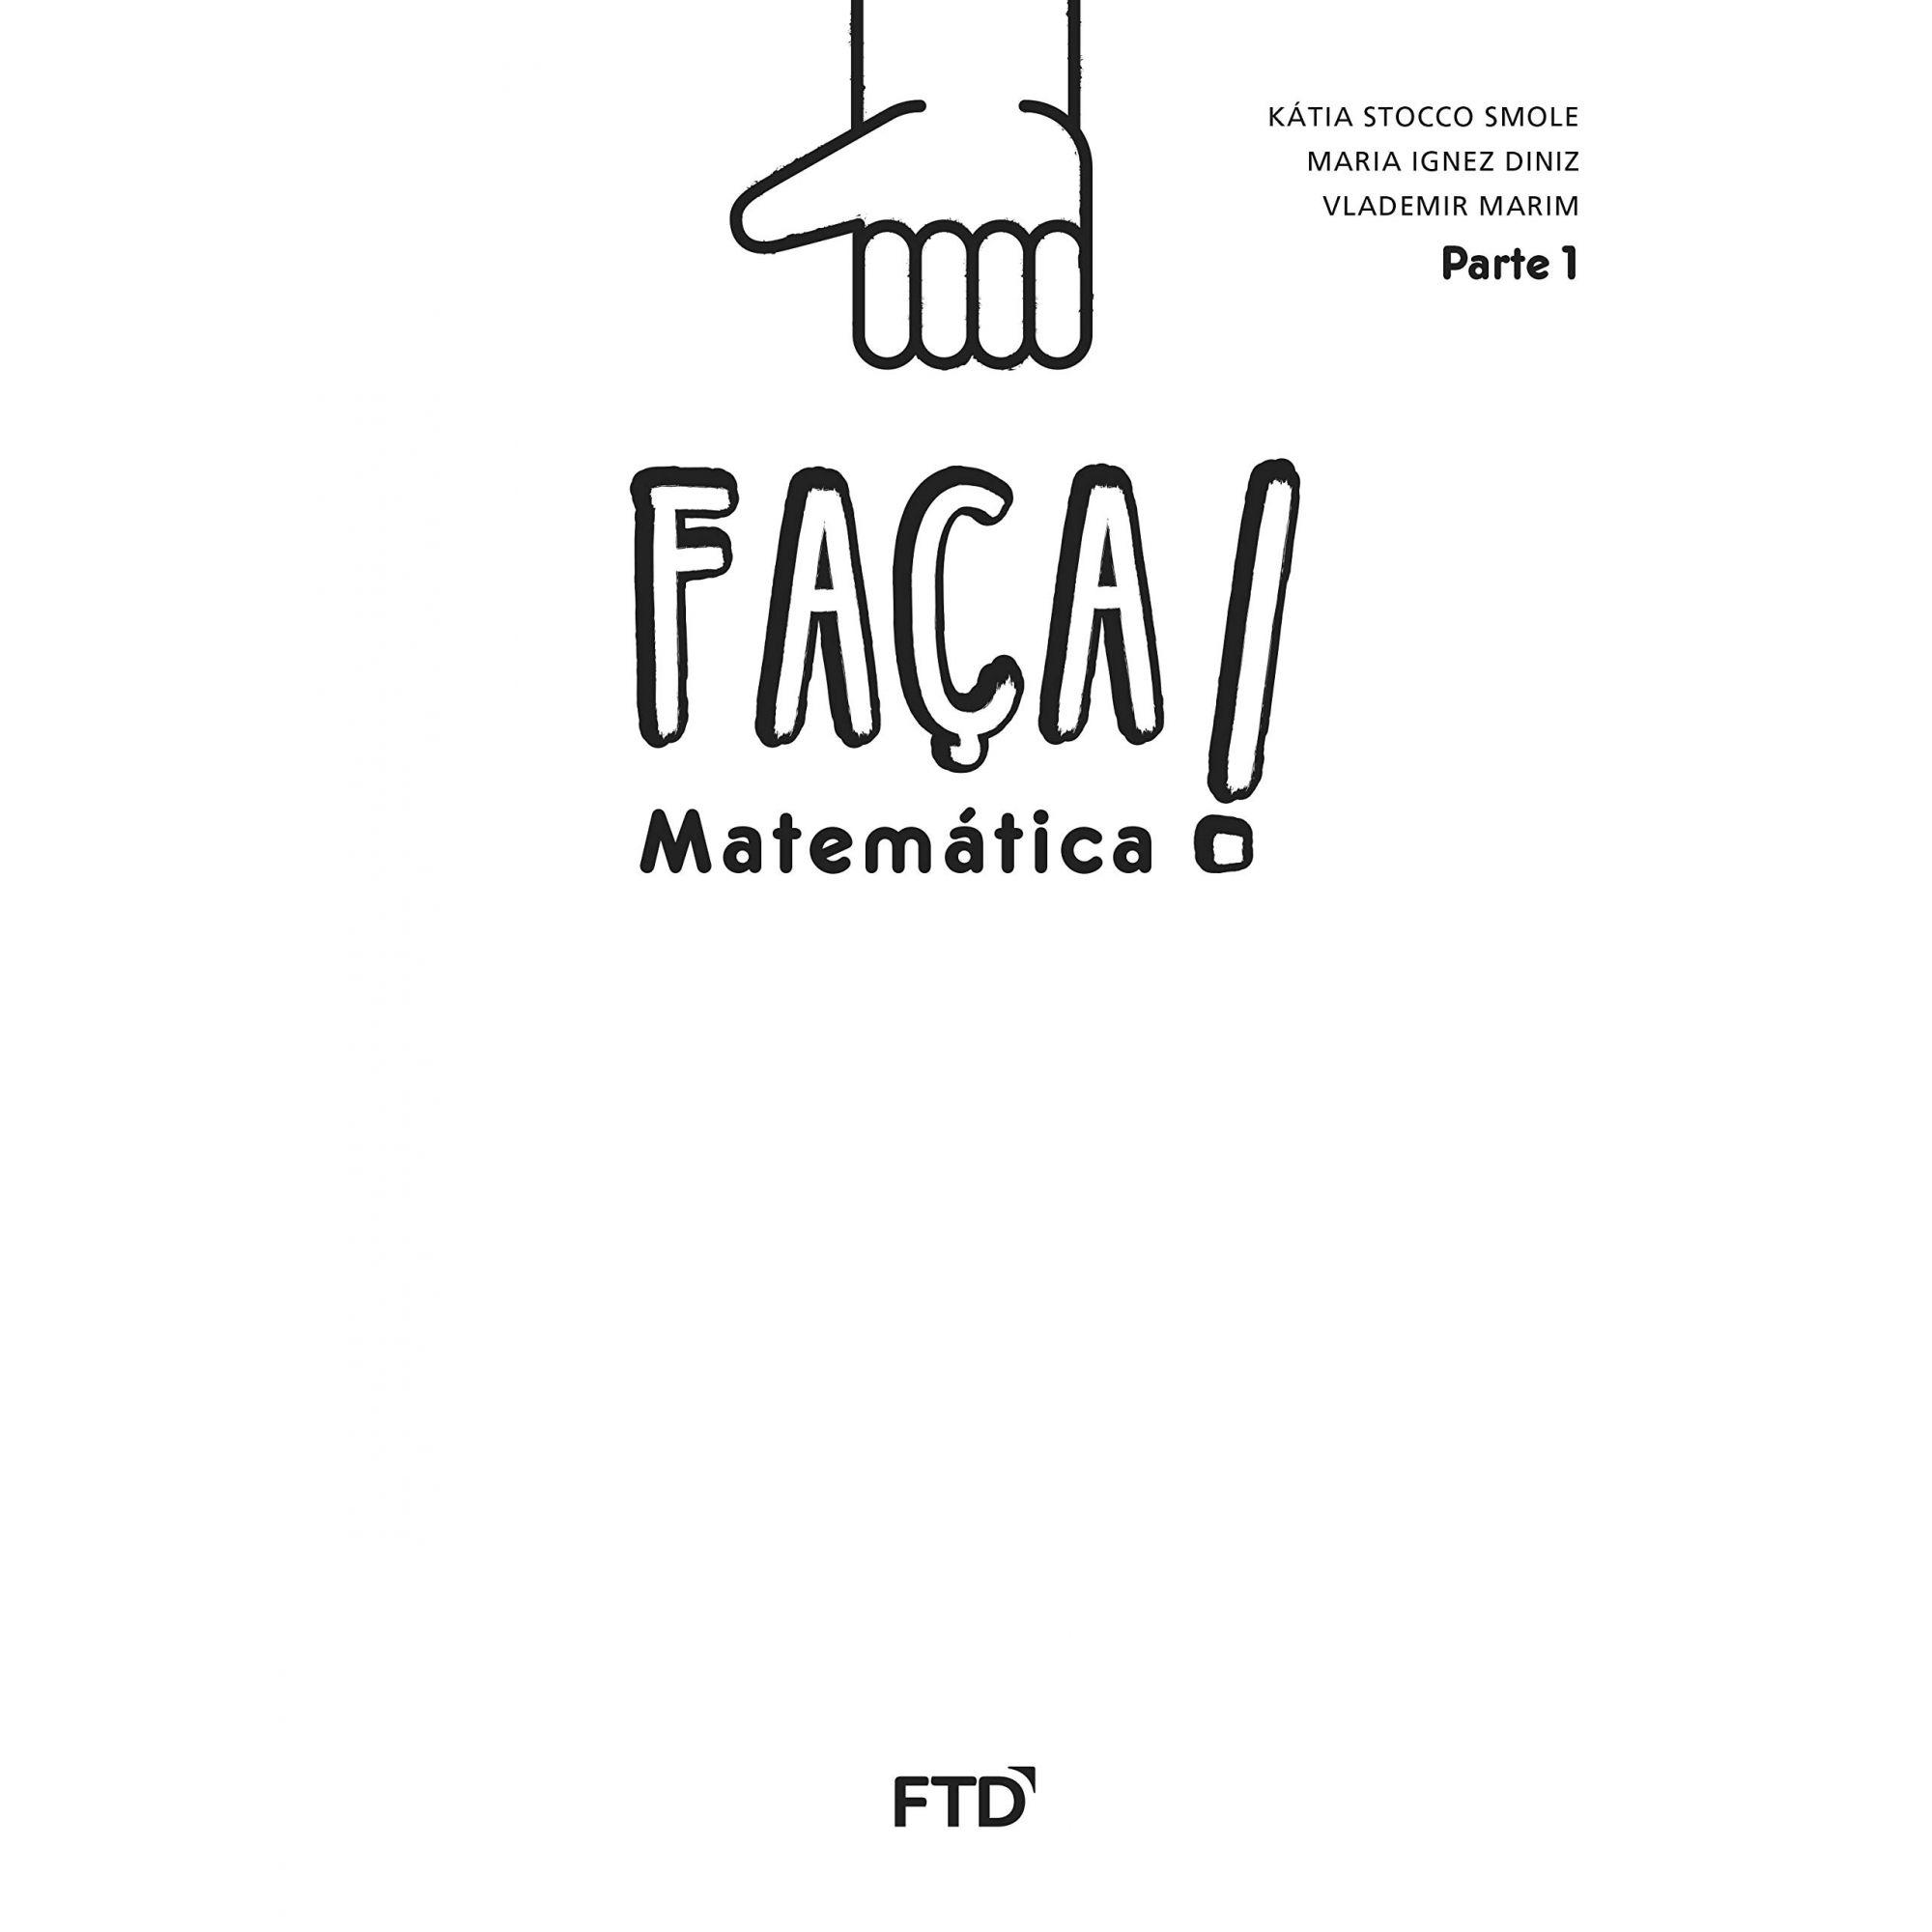 Faça! - Matemática - 1º ano: Conjunto [spiral_bound] Smole, Kátia Stocco,Diniz, Maria Ignez,Marim, Vlademir [Jan 01, 2016] …